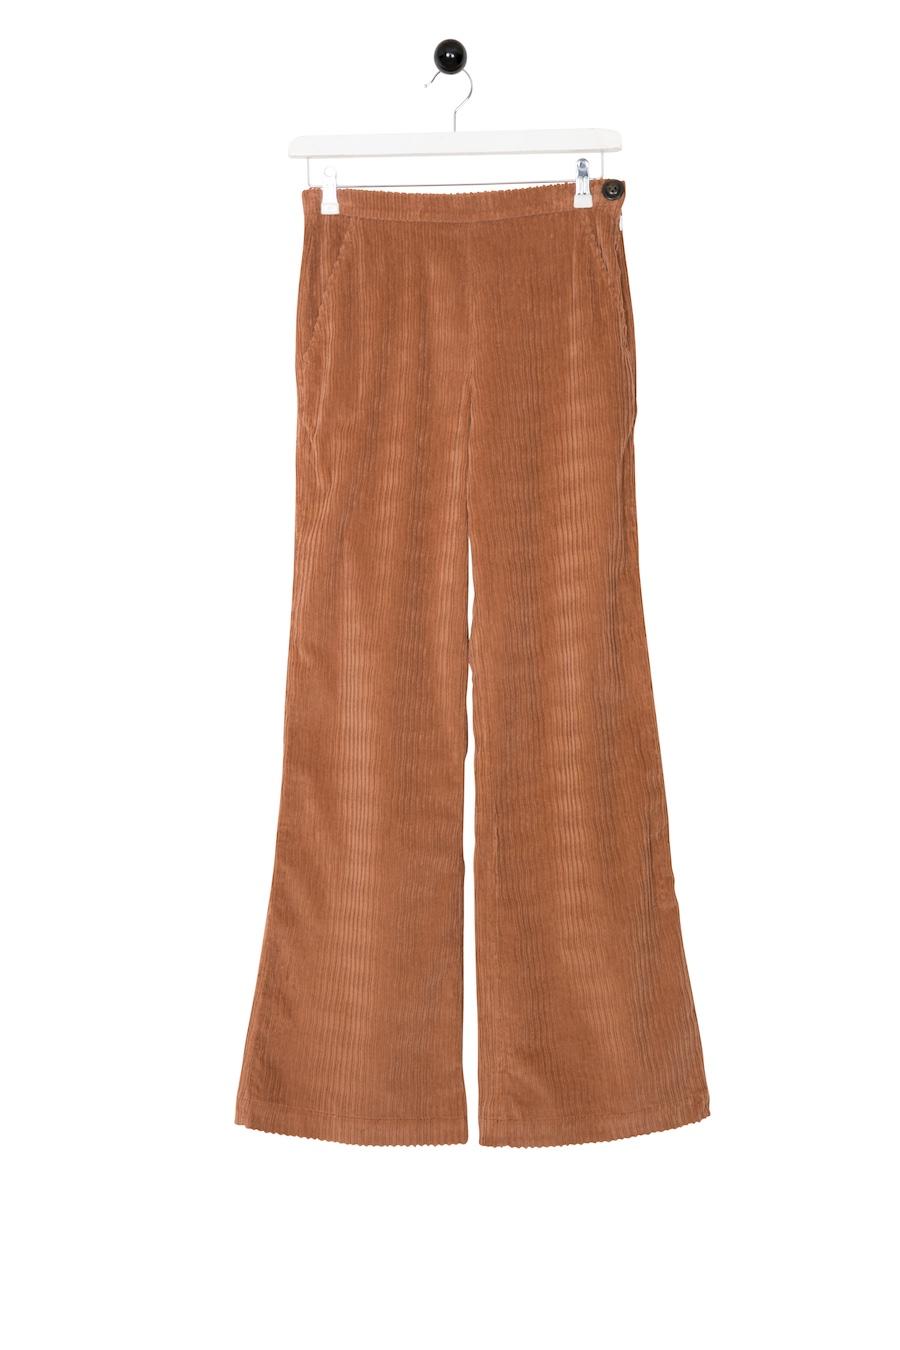 Selleri Trousers W